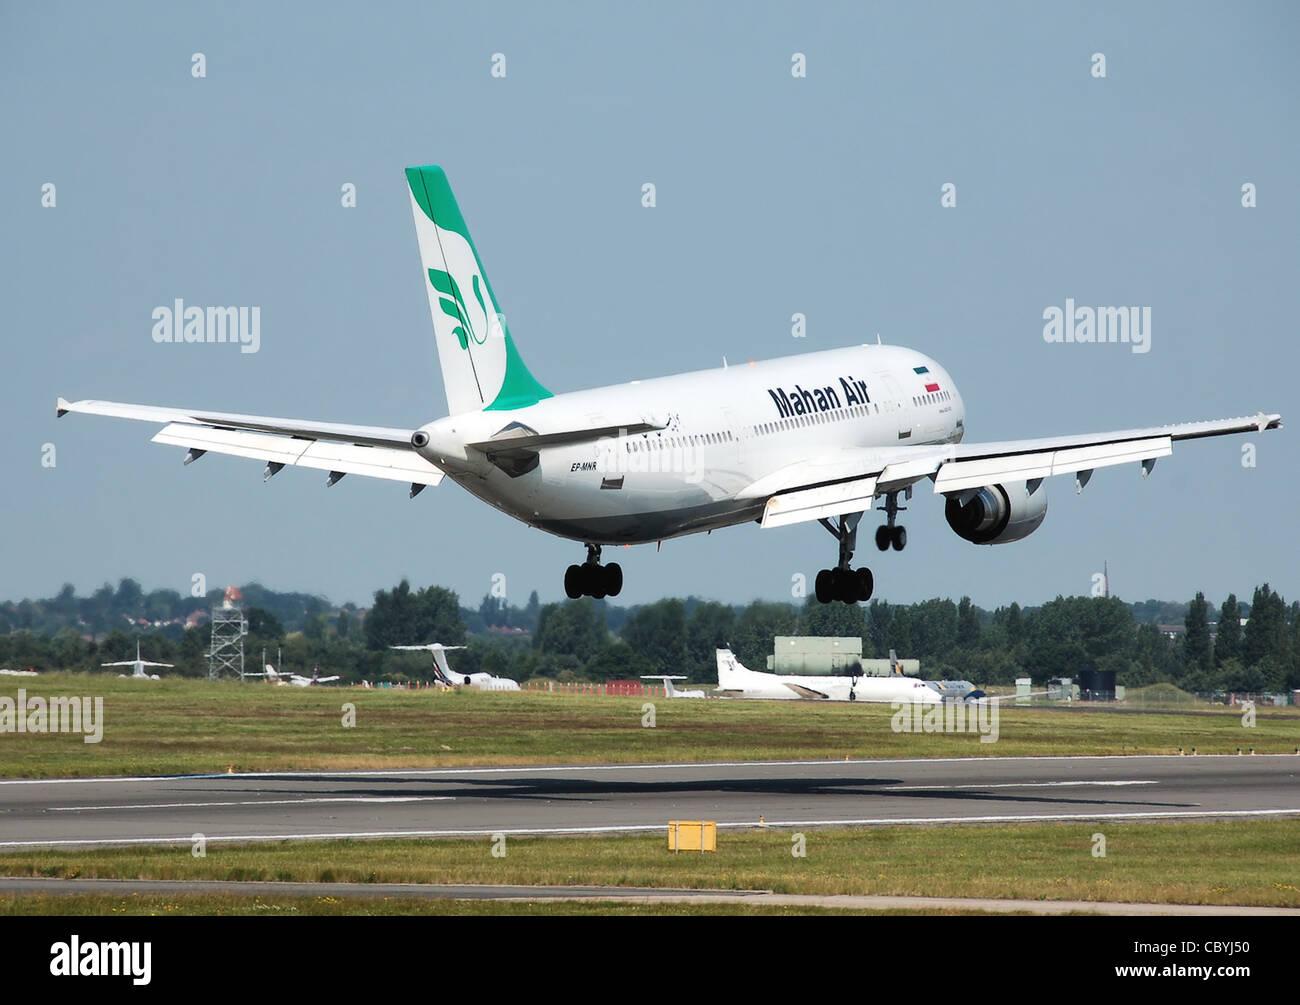 Mahan Air Airbus A300B4-600 (EP-MNR) lands at Birmingham International Airport, England. - Stock Image